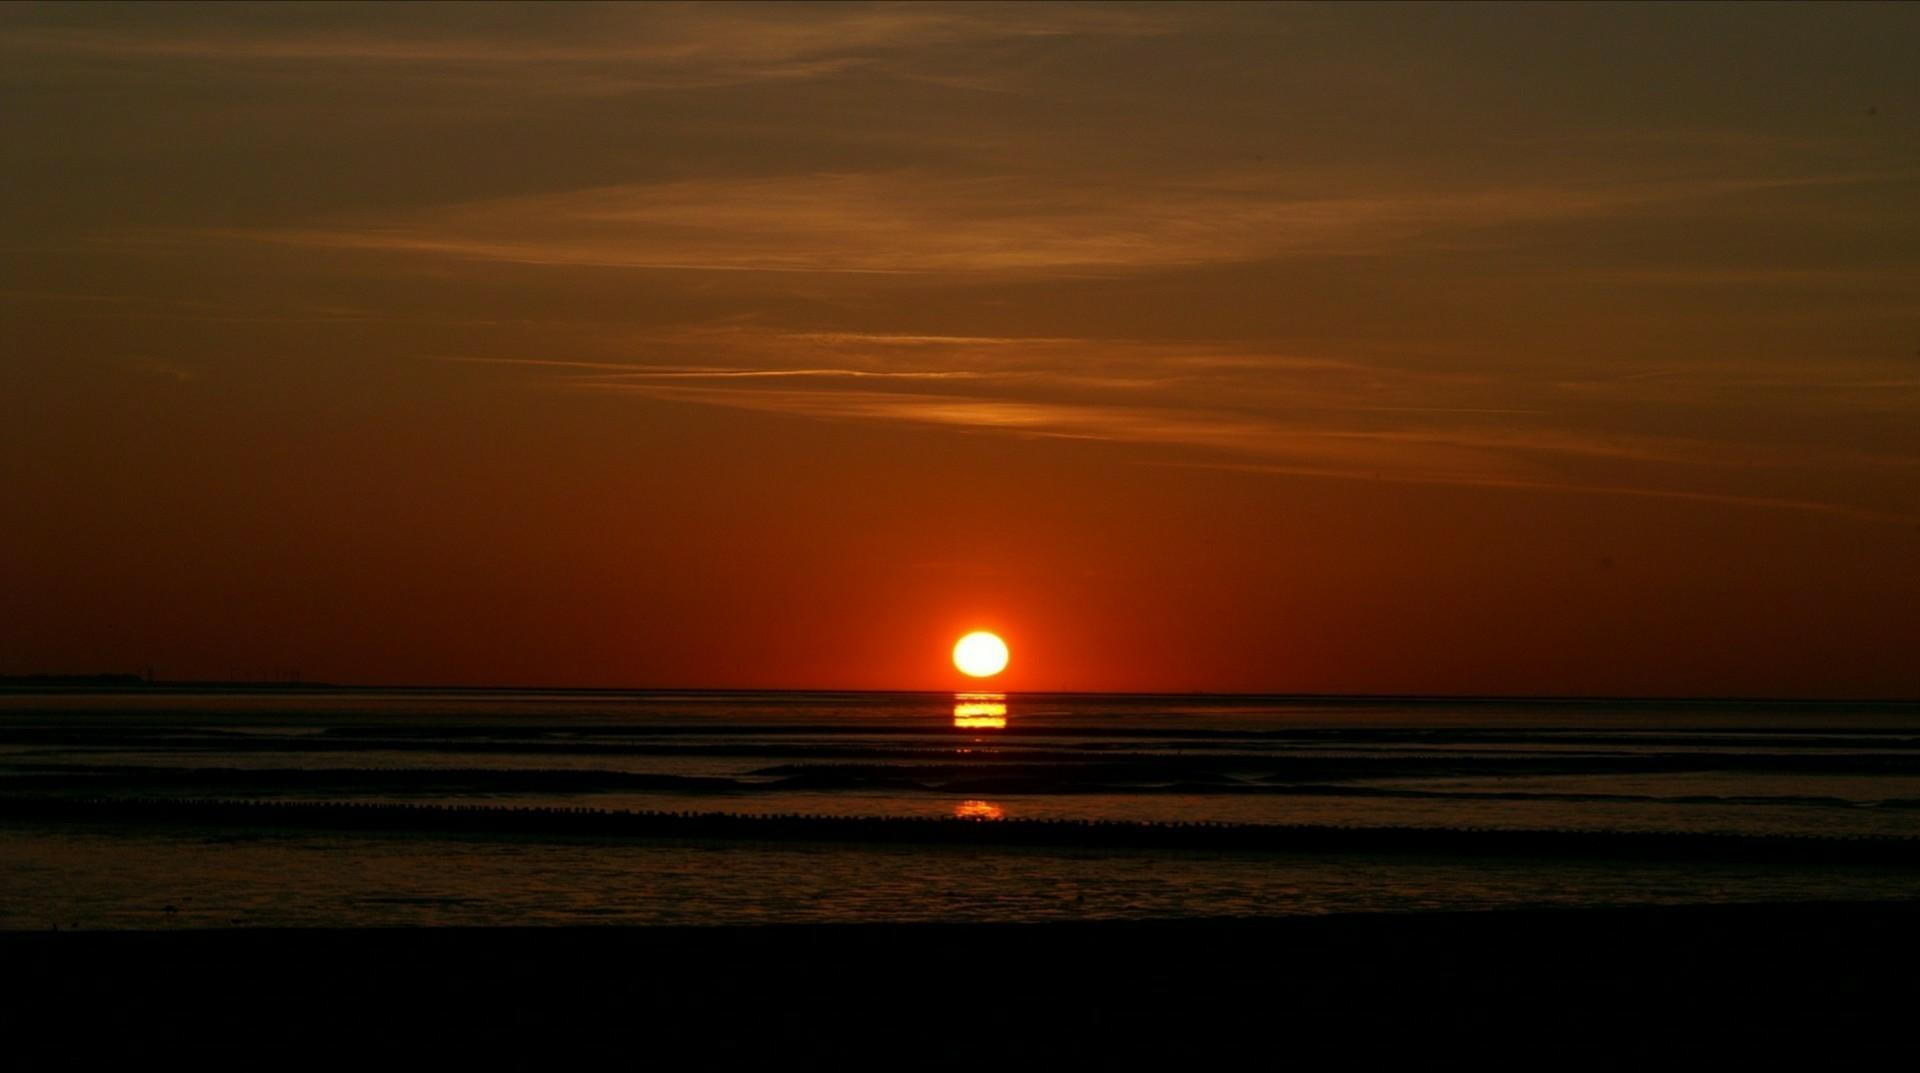 Waddenzee bij zonsondergang.